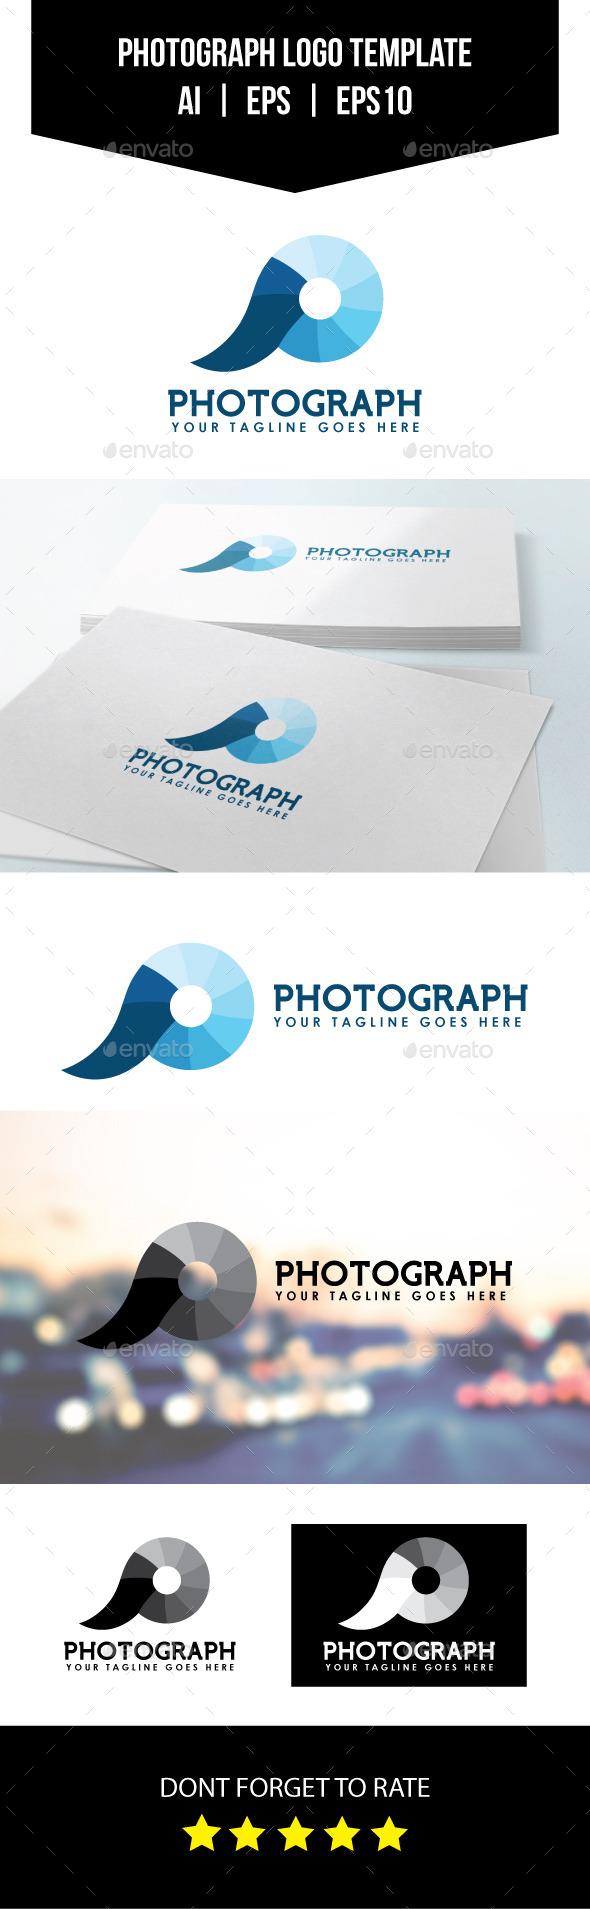 GraphicRiver Photograph Logo Template 10914132